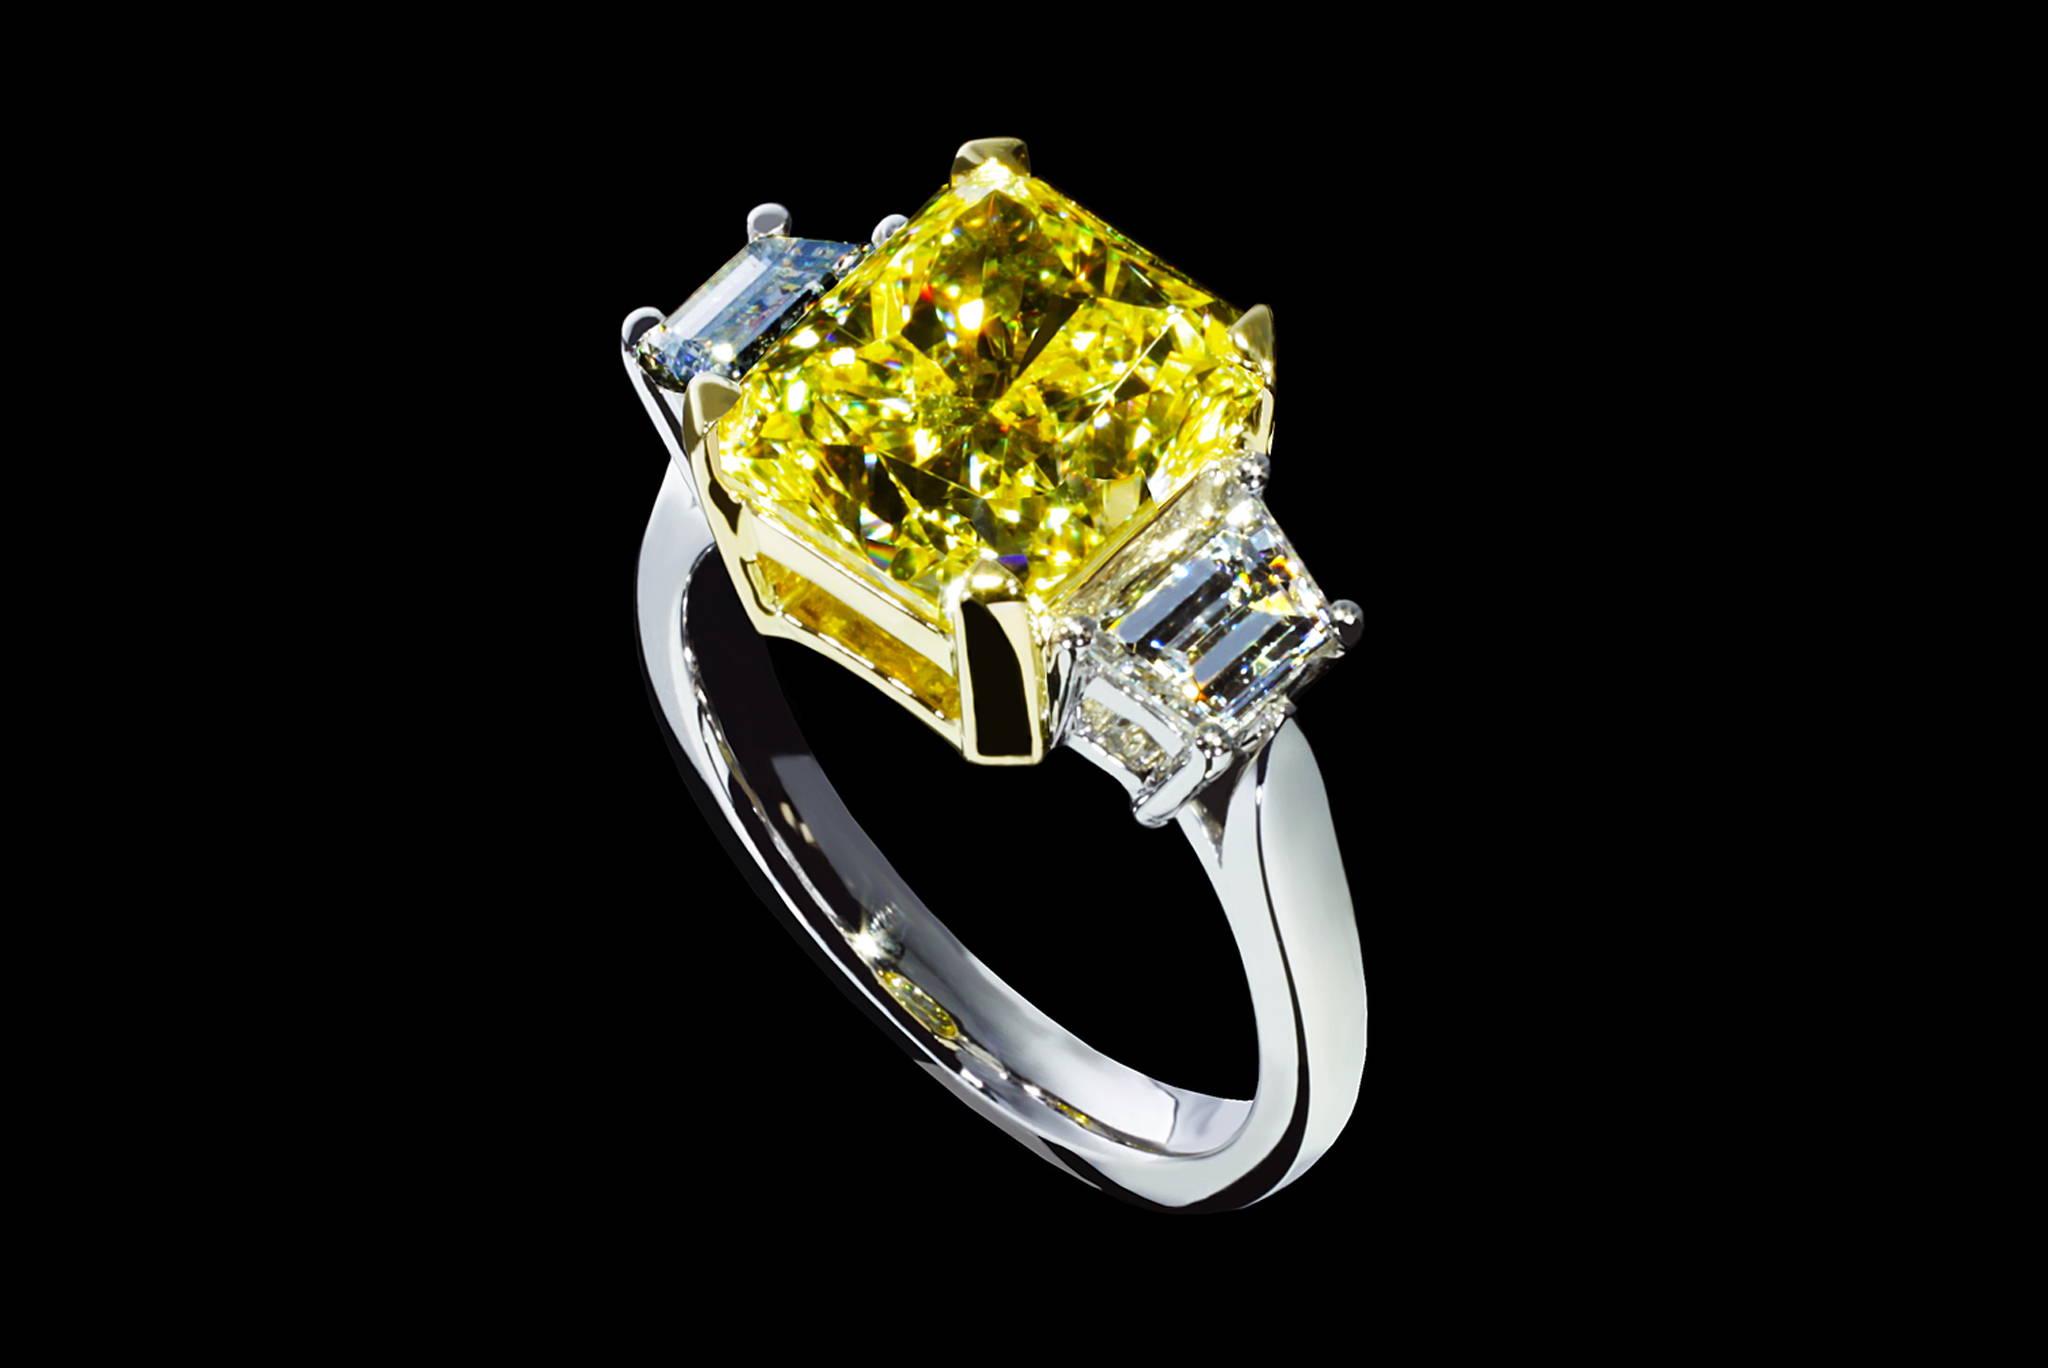 Vivid Yellow Diamond Ring 45 degrees view